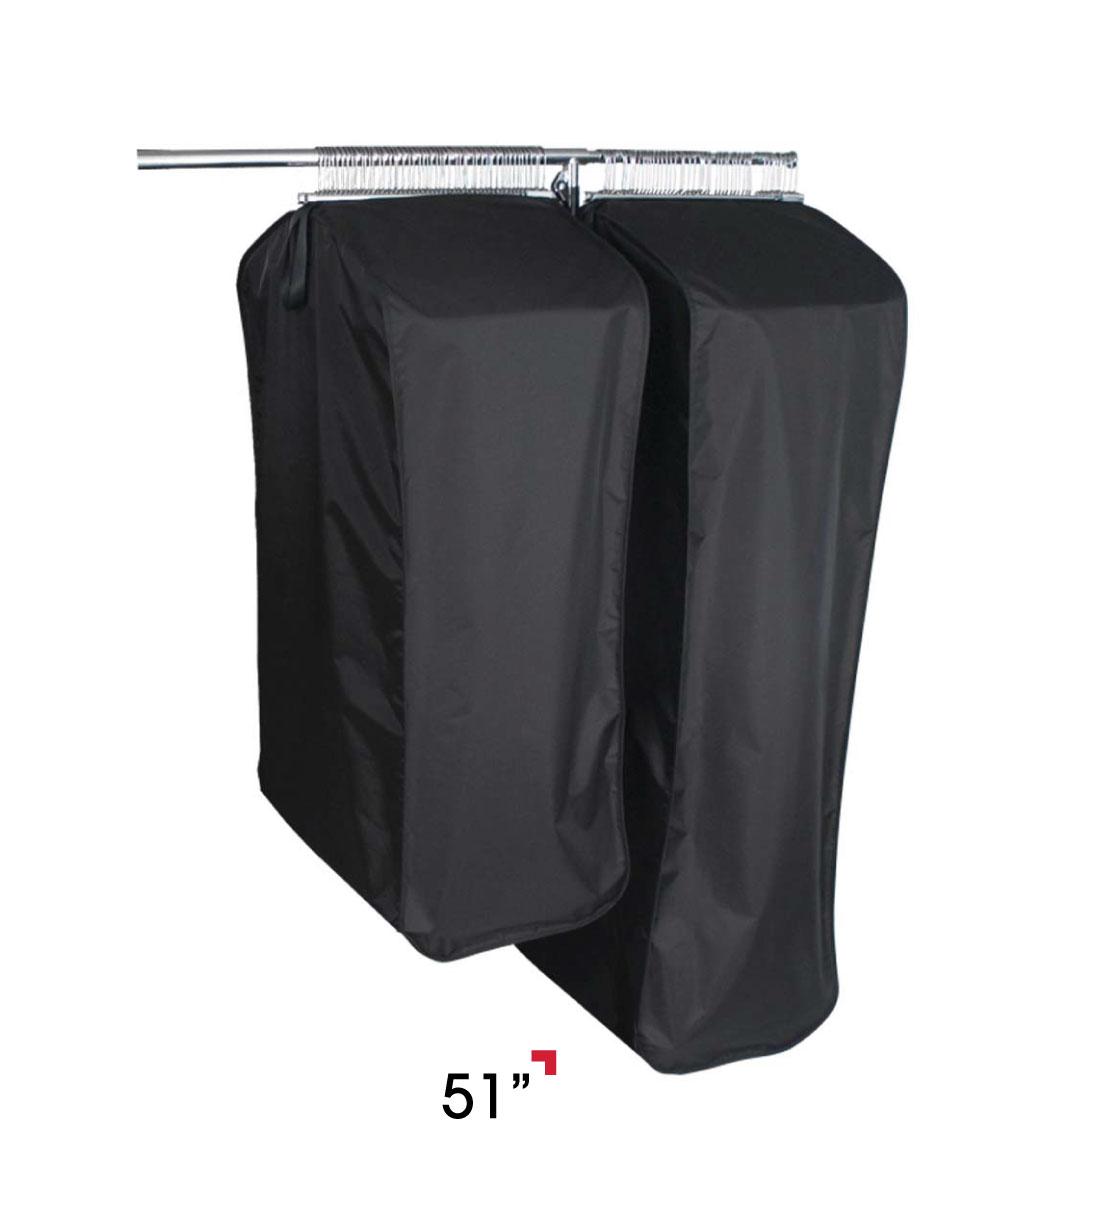 51 inch Garment bags